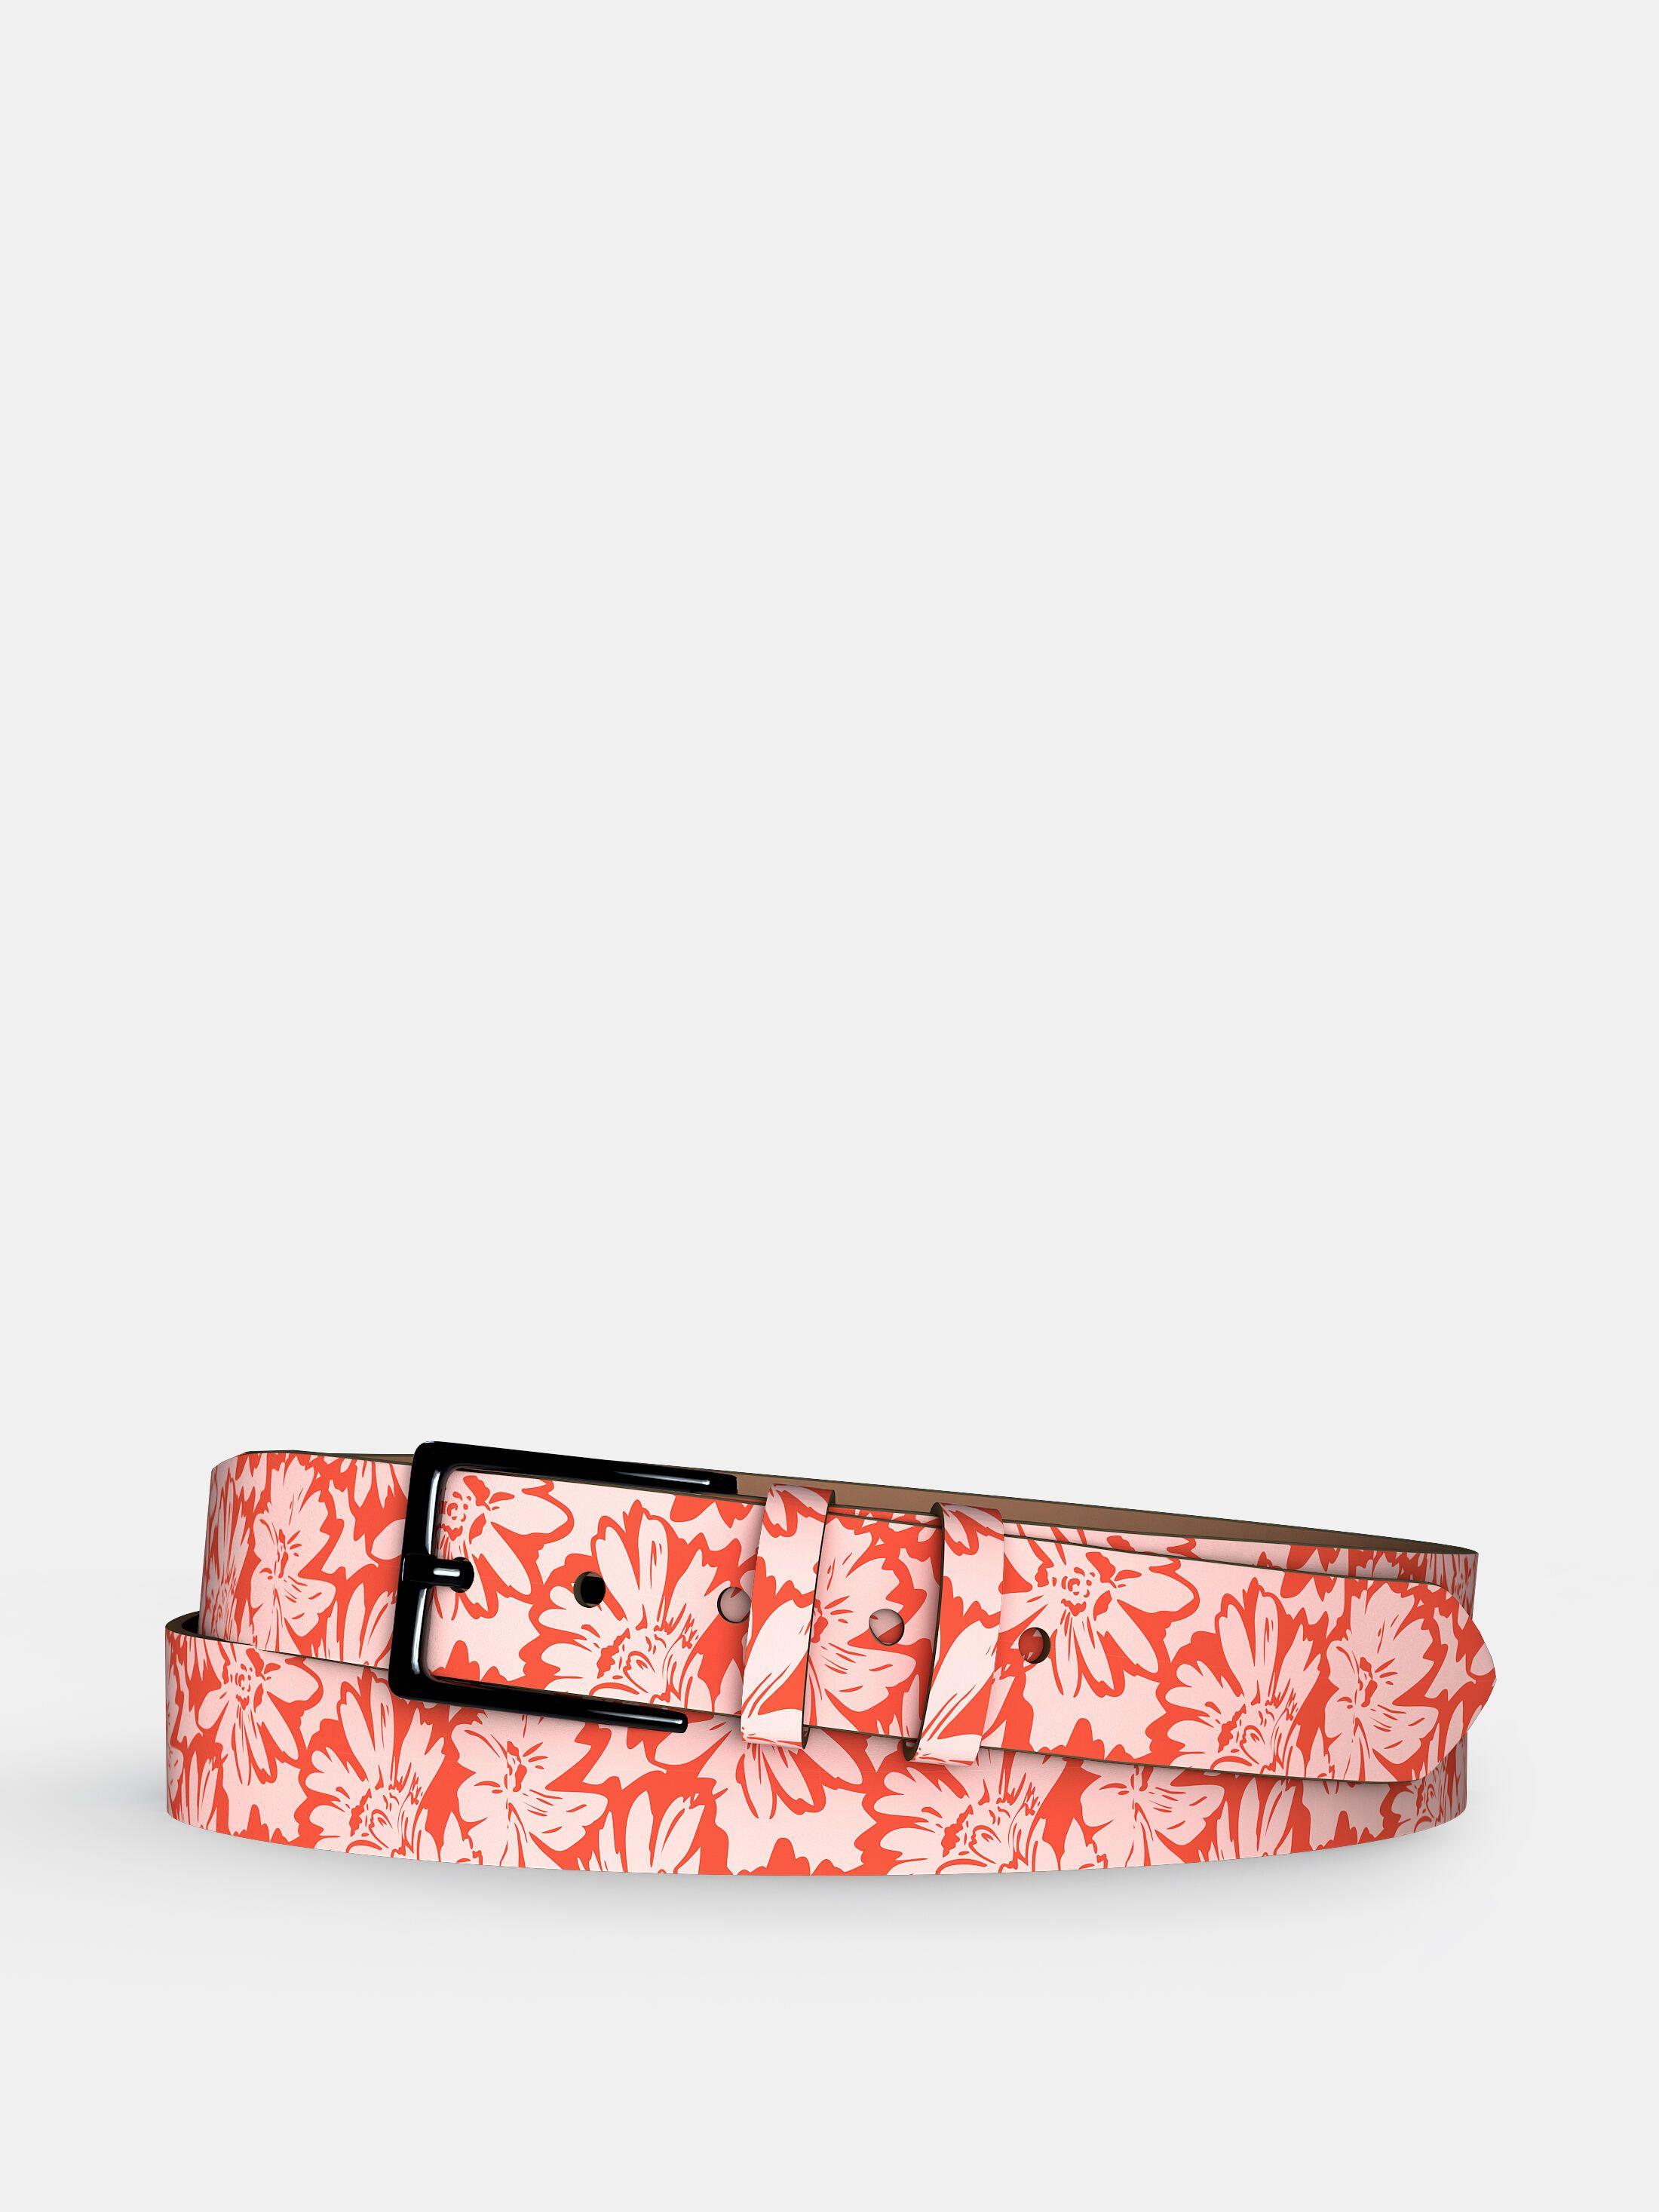 custom printed leather belt